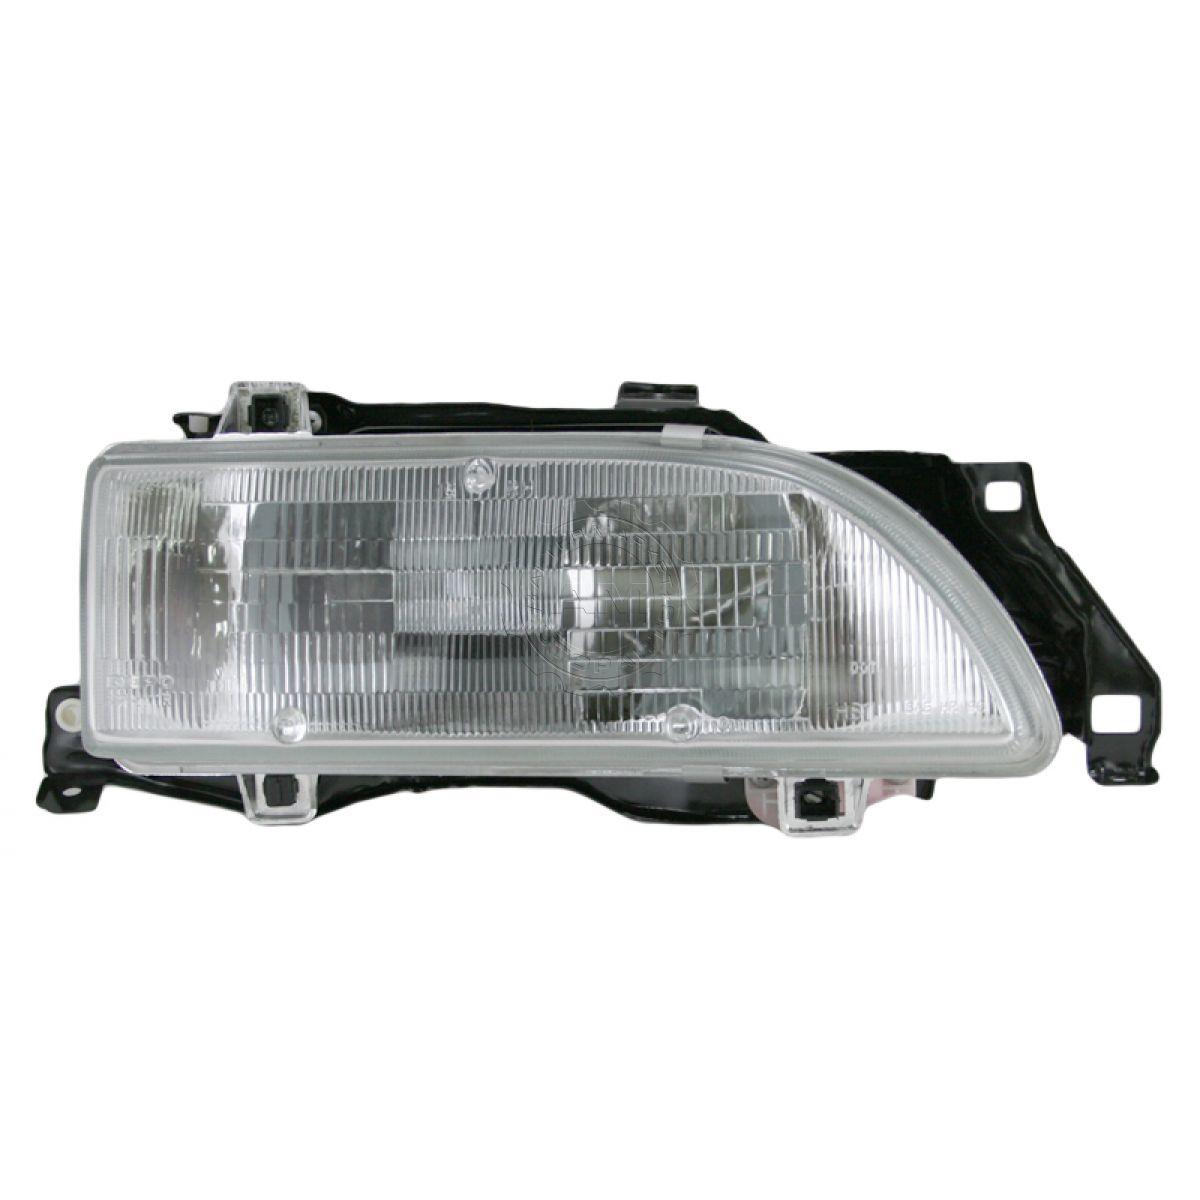 hight resolution of headlight headlamp passenger side right rh new for 89 92 geo prizm